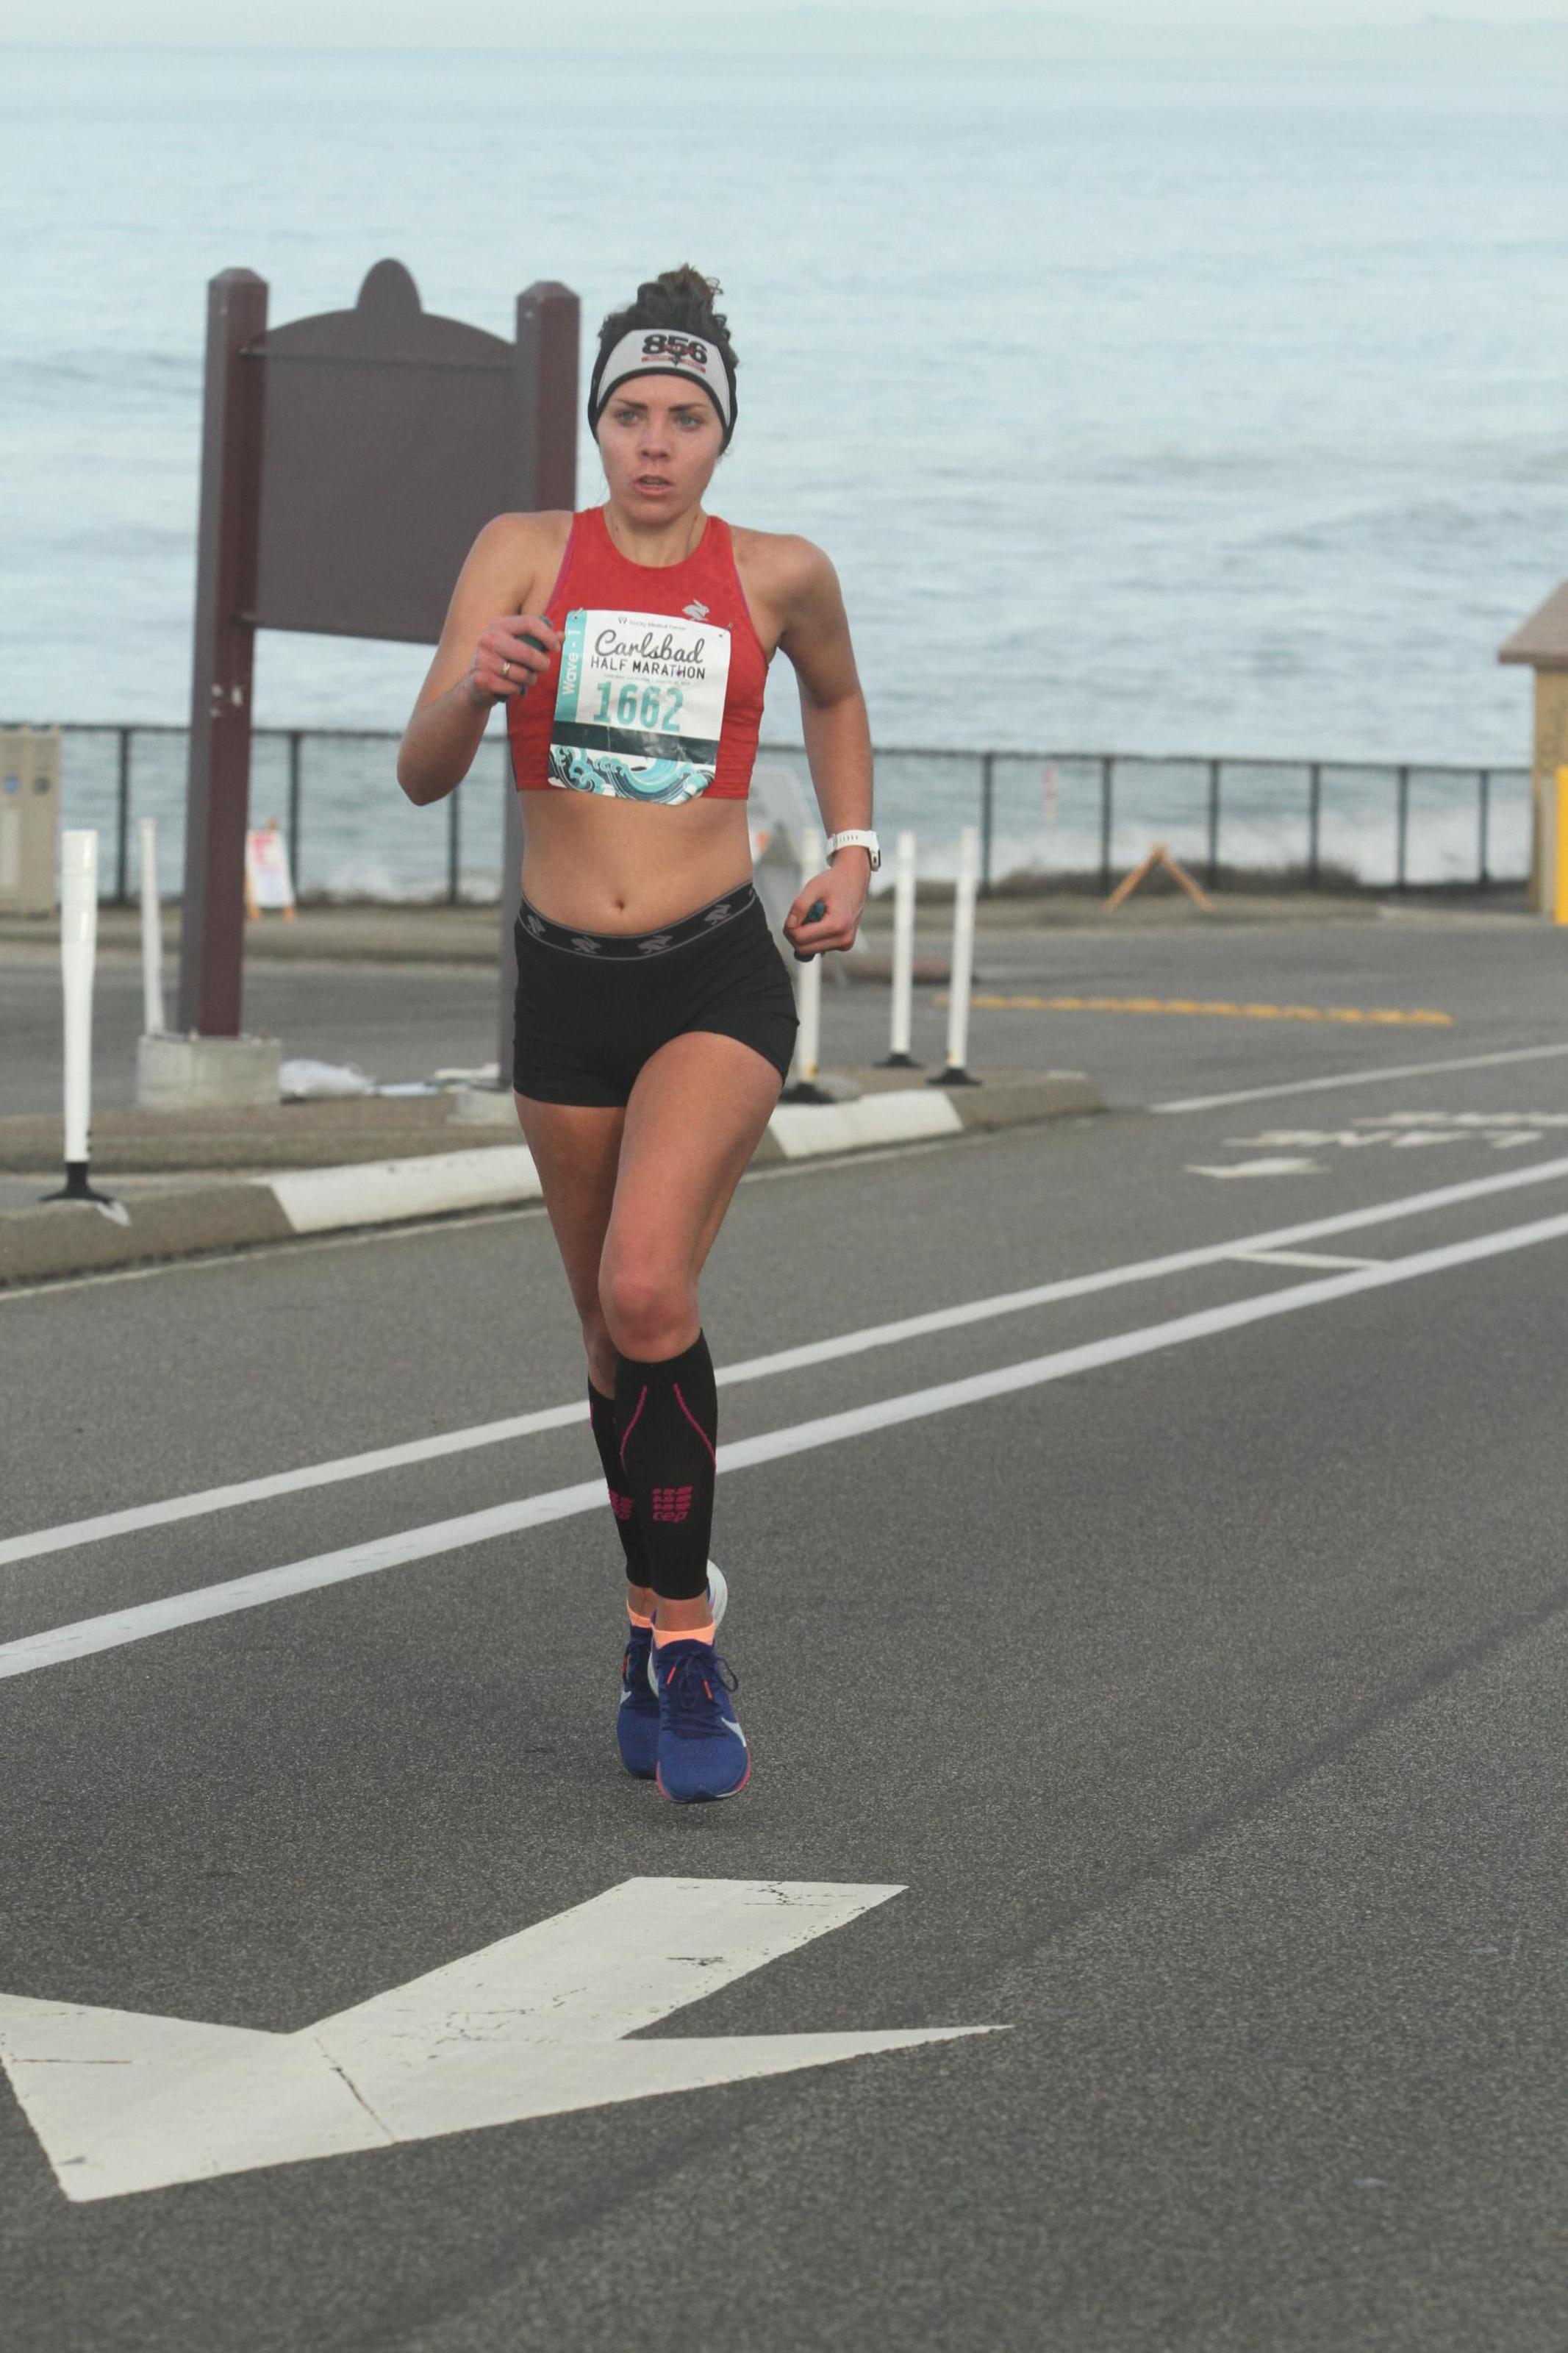 Carlsbad Half Marathon (1 29.47) FueledByLOLZ f34ed5e4e35